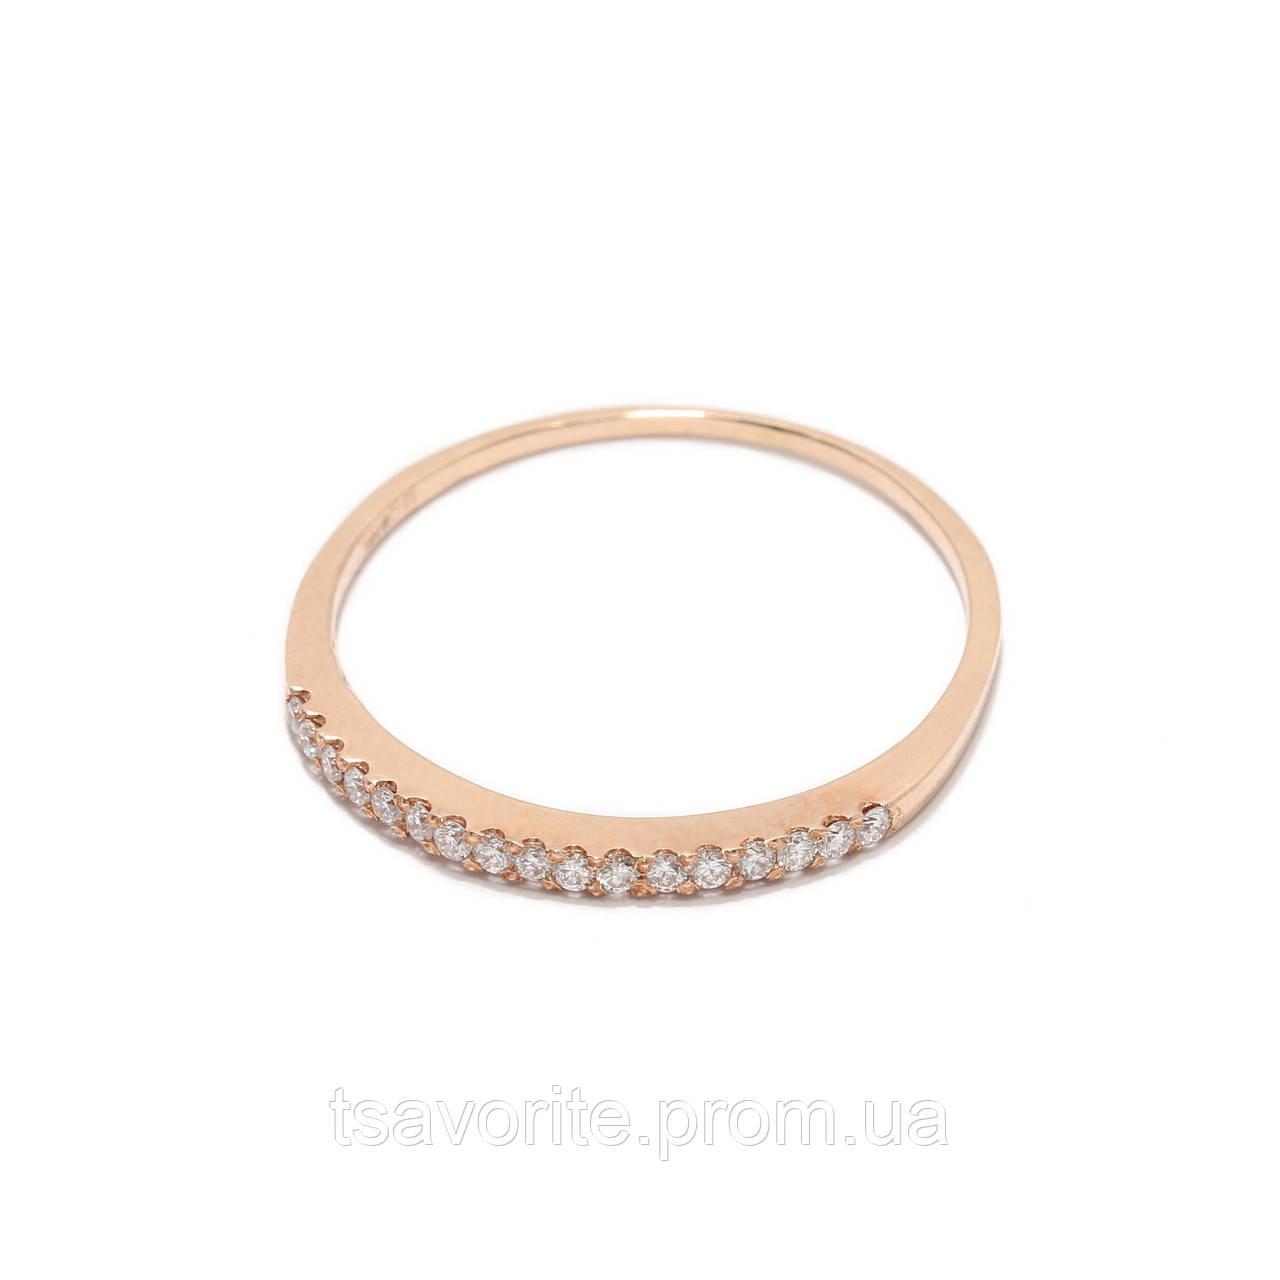 Золотое кольцо с бриллиантами 2231468